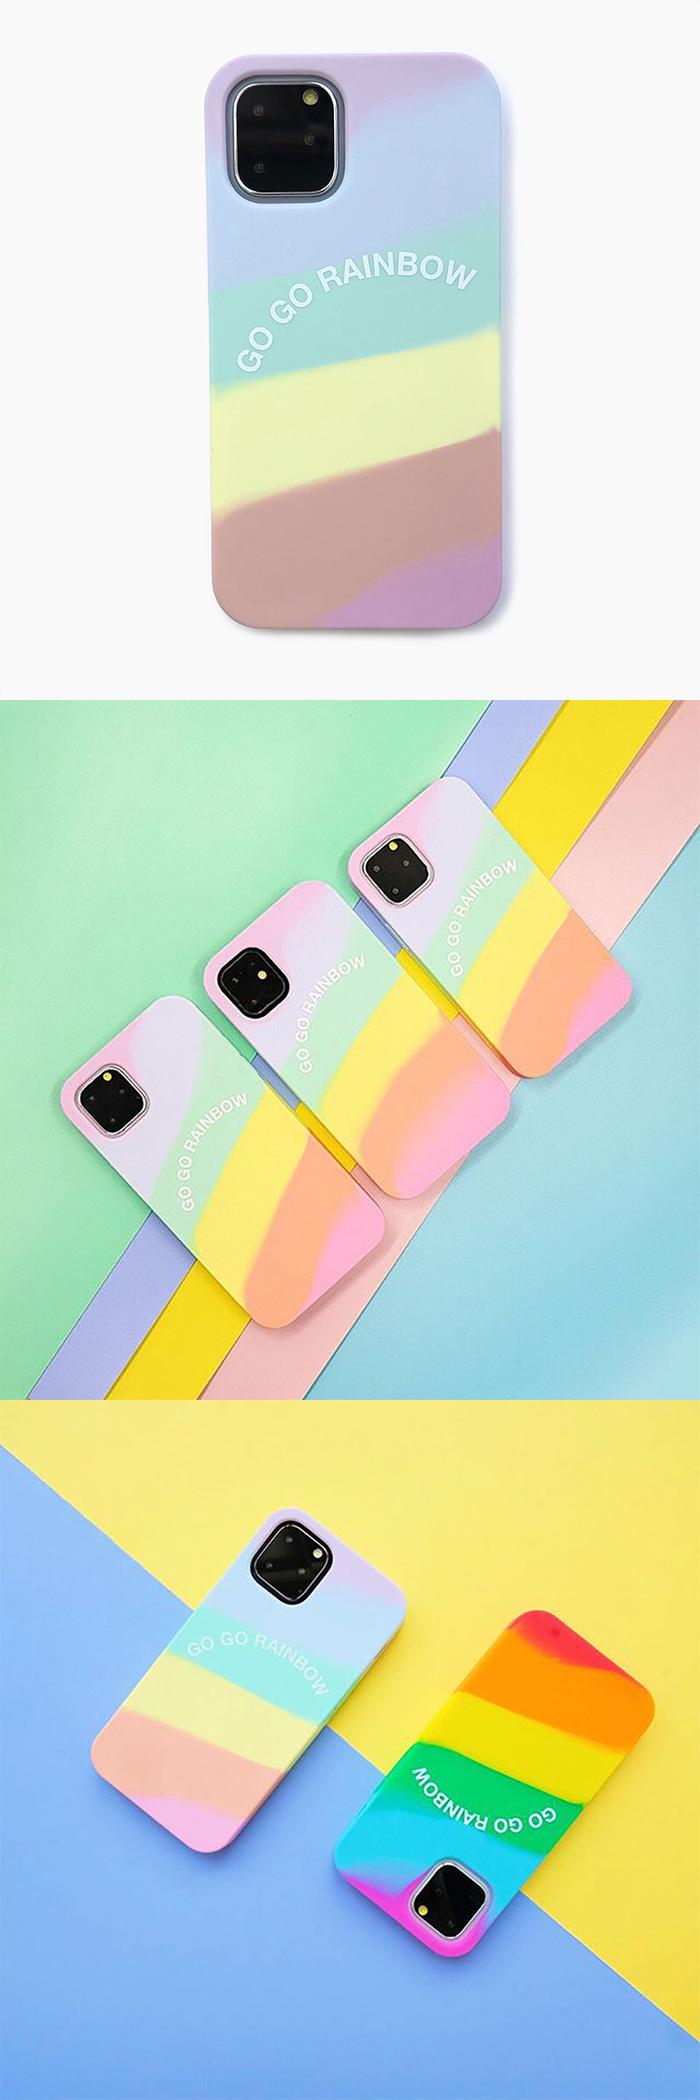 Candies|Simple系列 光之彩虹 - iPhone 11 Pro